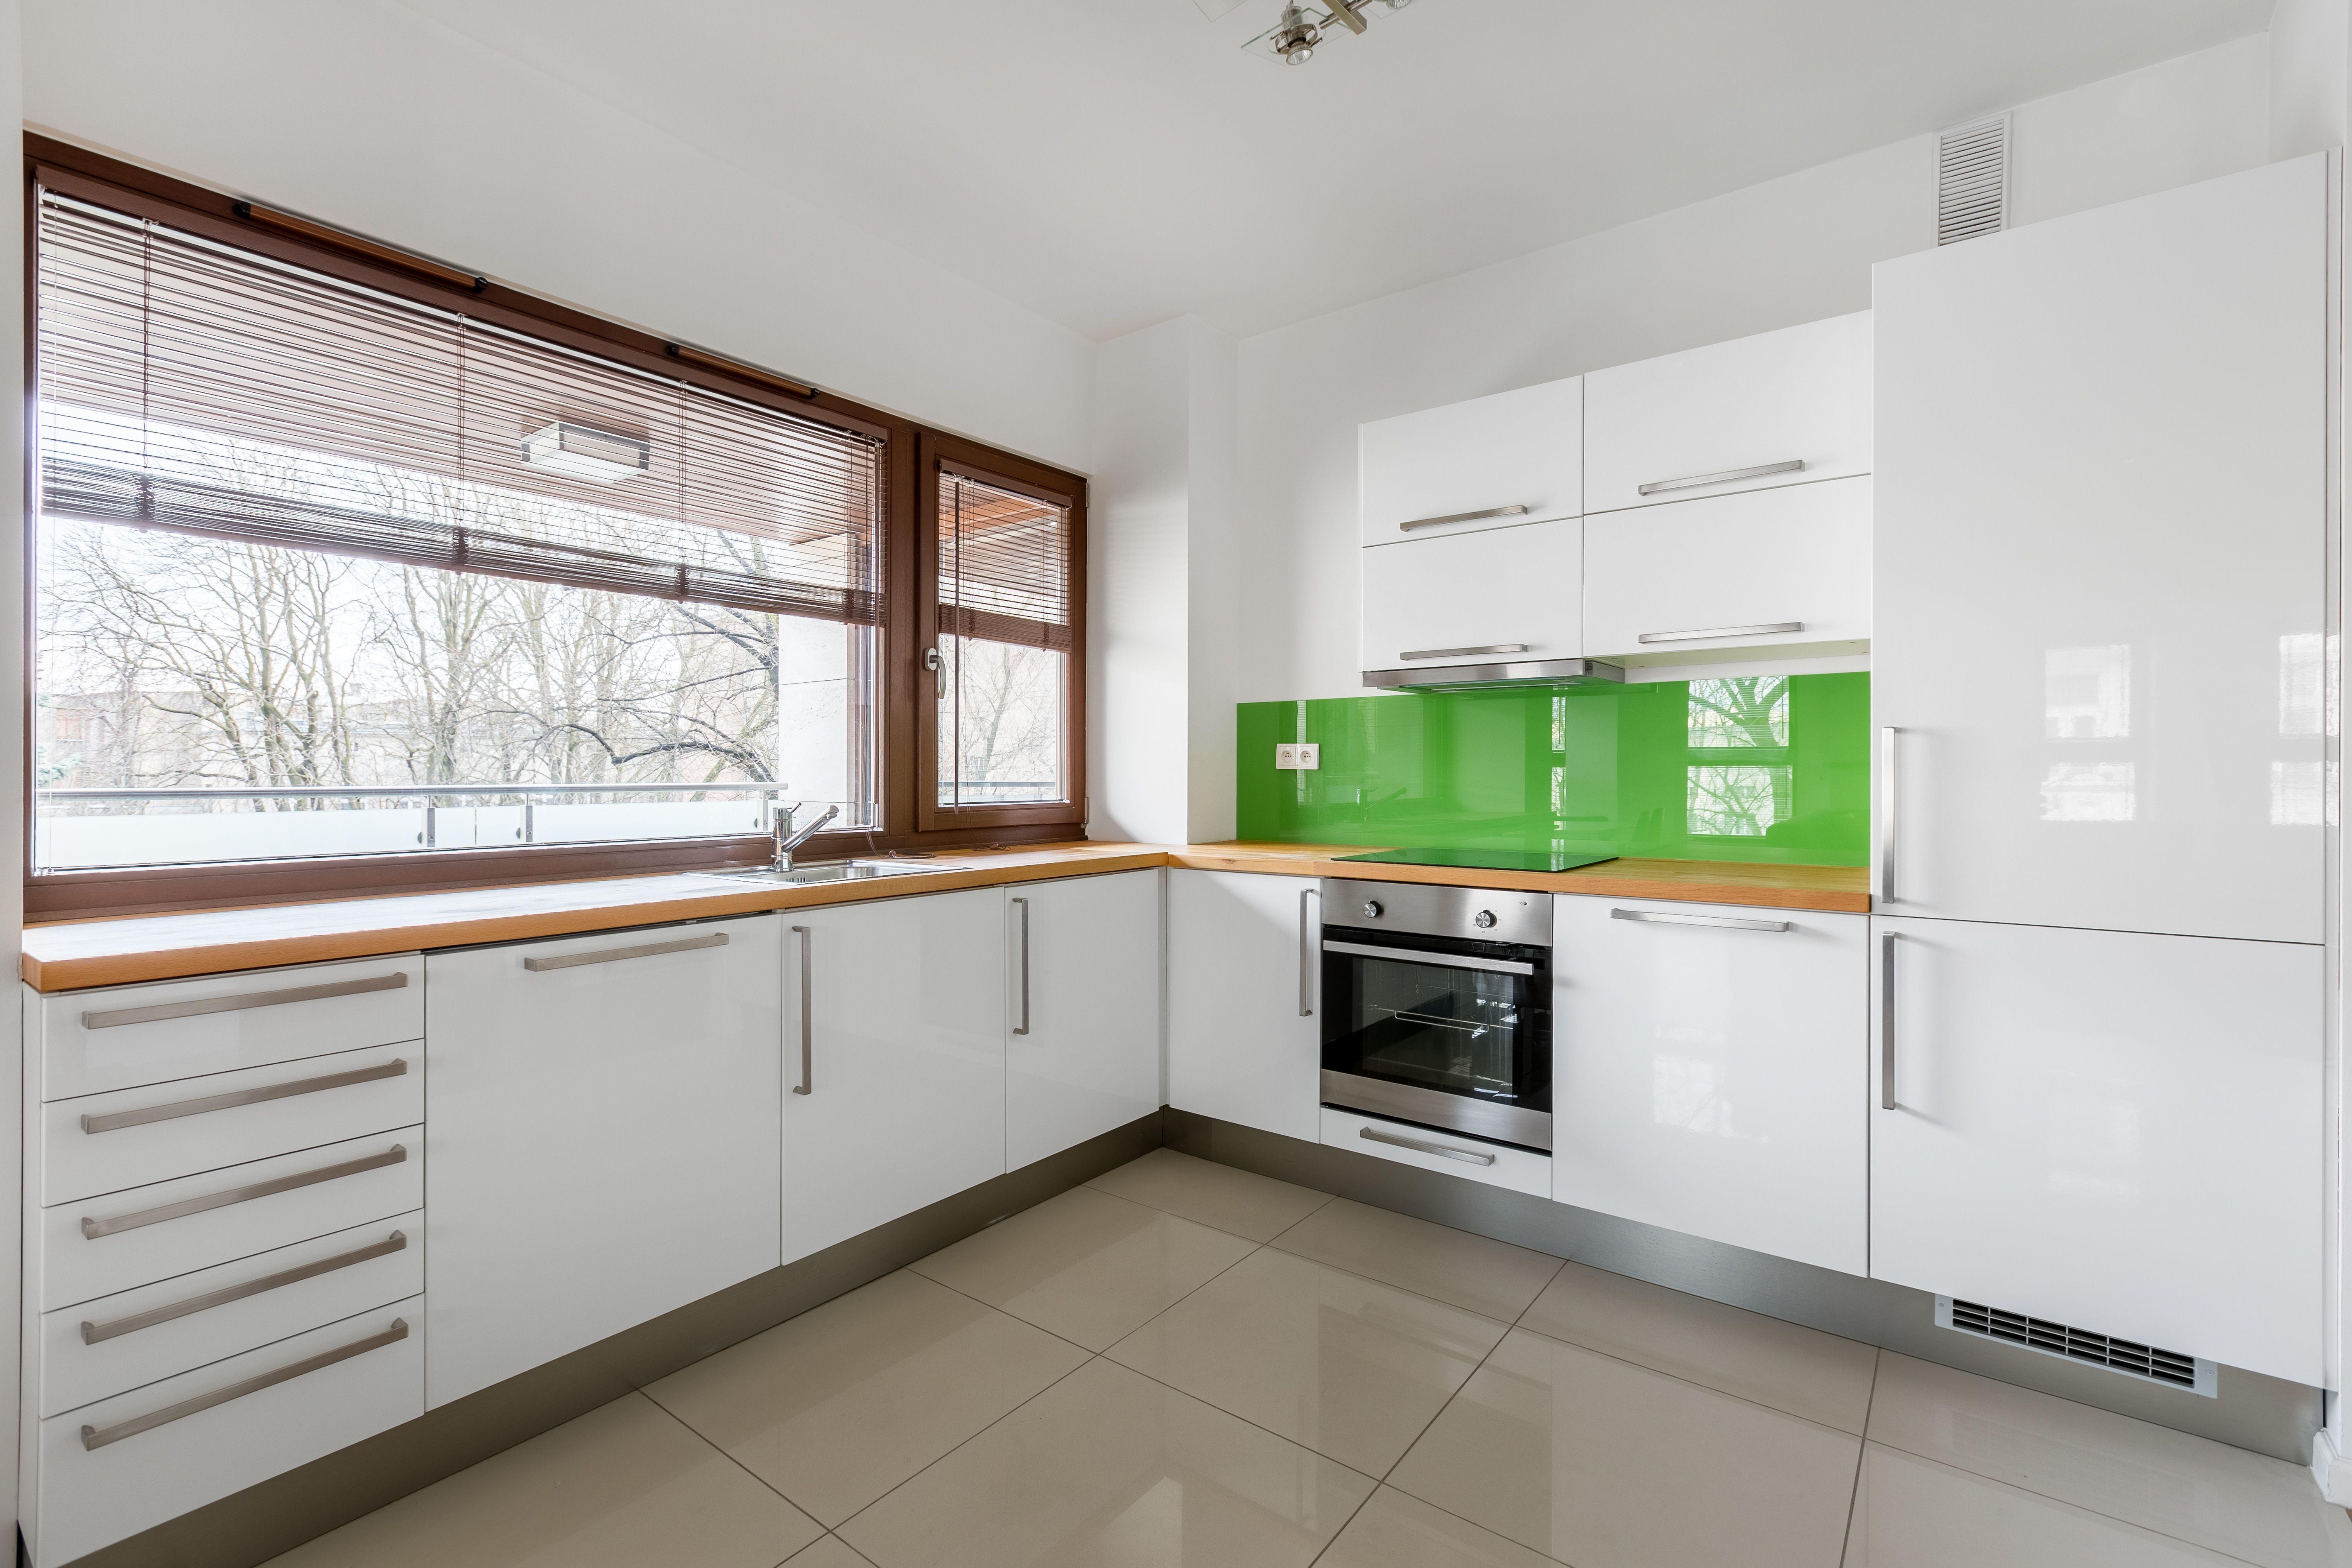 Akril Splashback Range Kitchen Acrylic Splashbackcolour  Olive Cool Range Kitchen Design Ideas